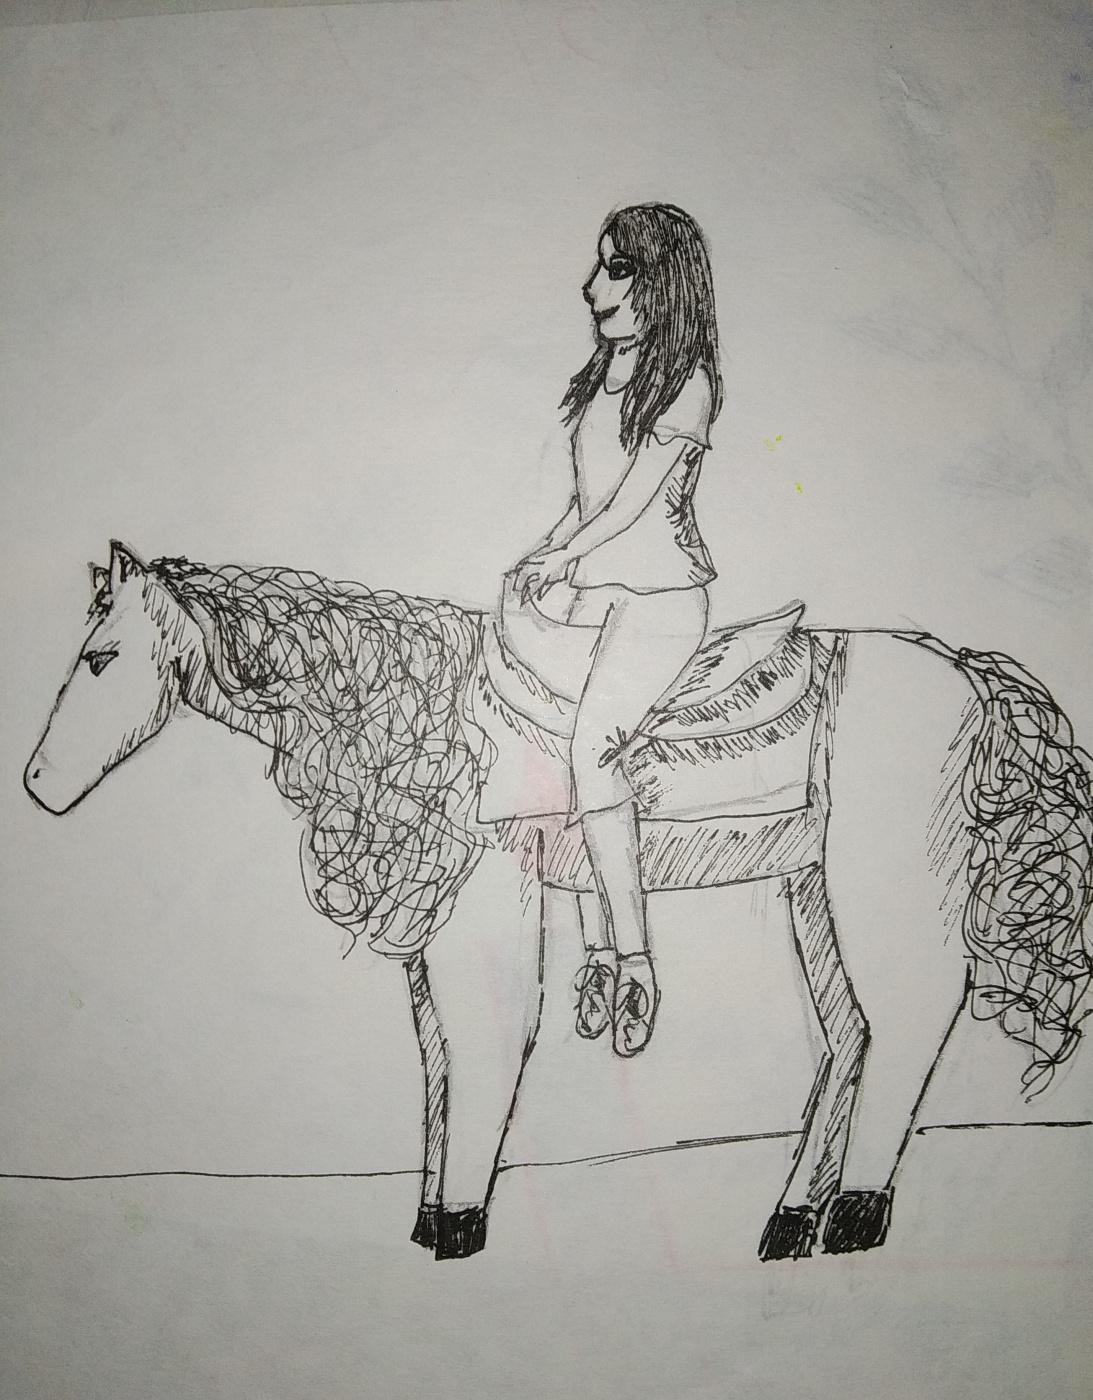 Zina Vladimirovna Parisva. Equestrian self portrait